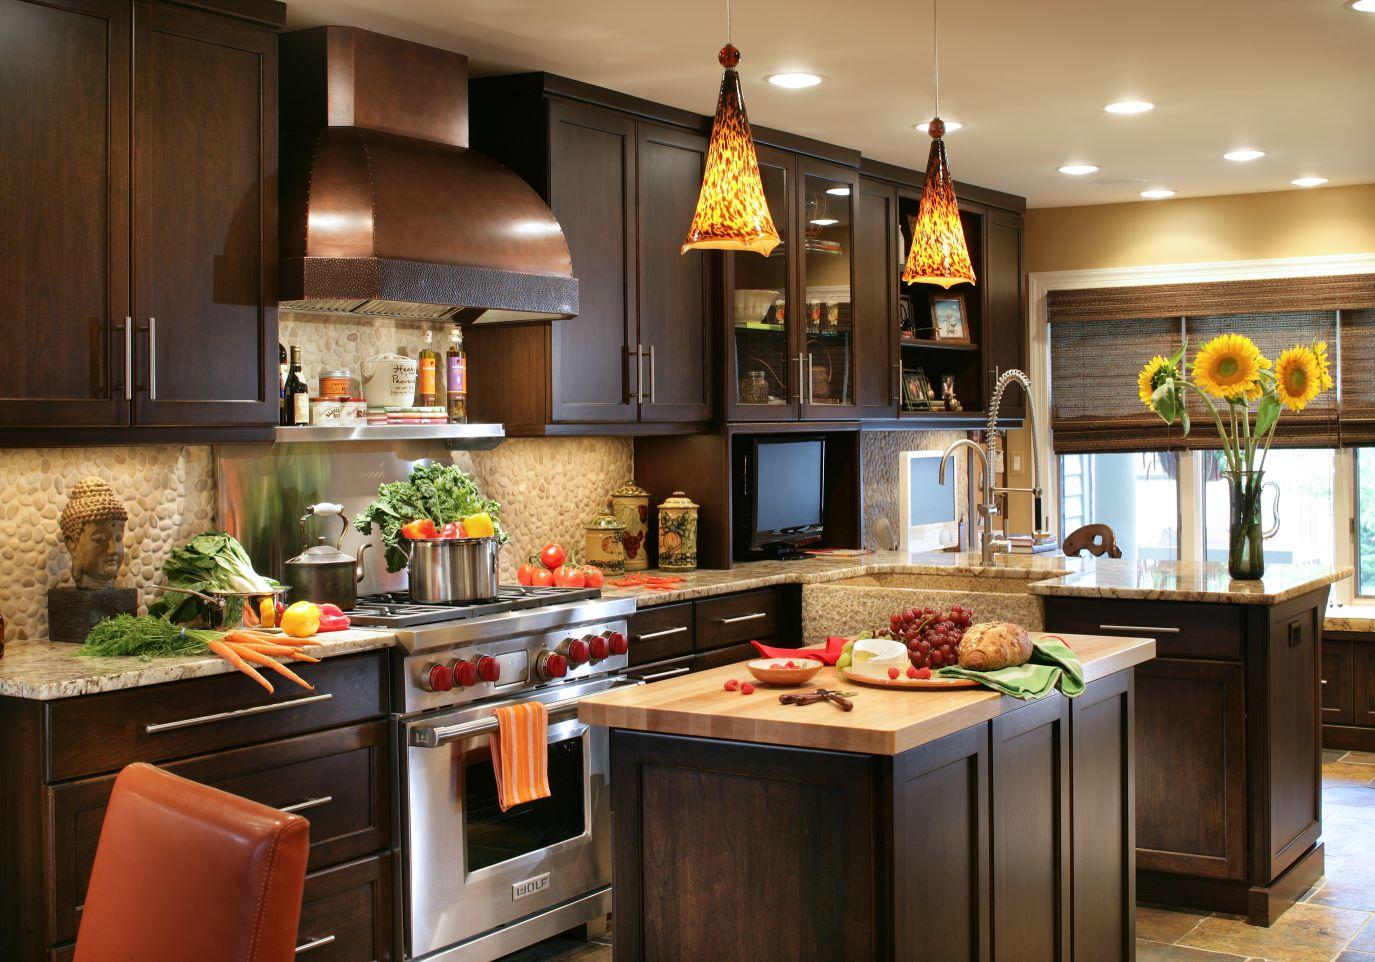 30 Popular Traditional Kitchen Design Ideas on Traditional Kitchen Decor  id=39339